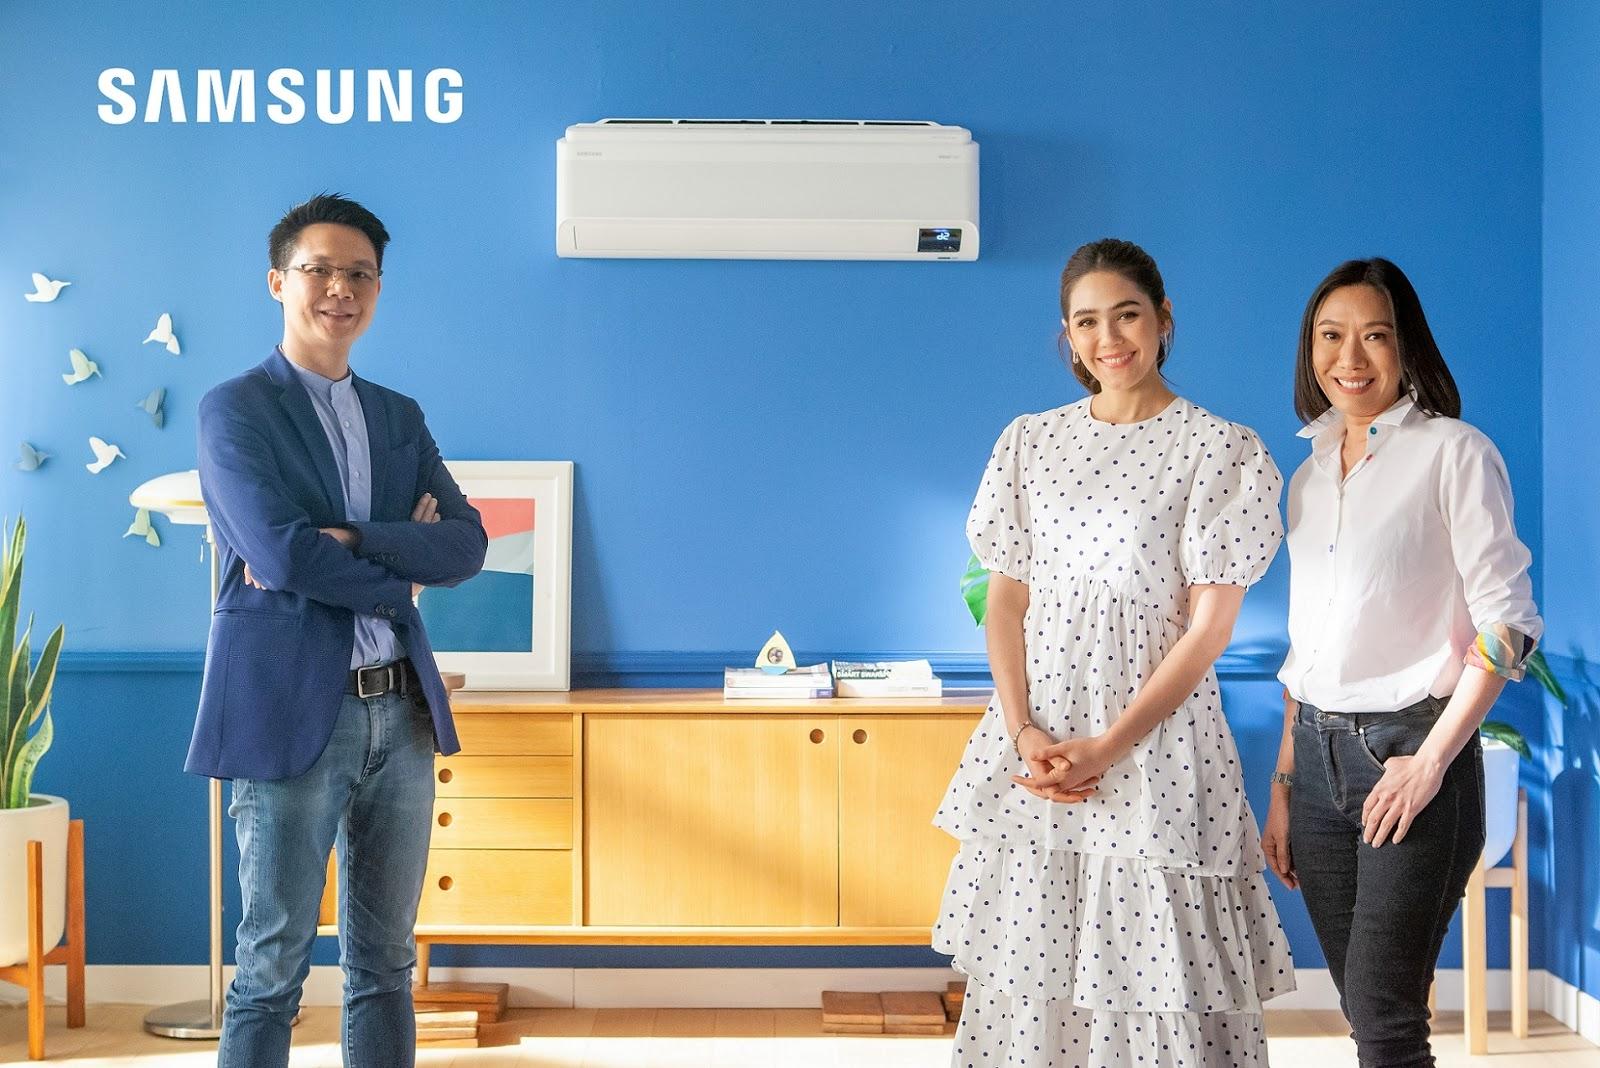 "Samsung รุกตลาดแอร์เพื่อสุขภาพ ชูเทคโนโลยี WindFree coolingดึง ""ชมพู่ อารยา"" เป็นพรีเซนเตอร์ เจาะตลาดครอบครัวยุคใหม่"